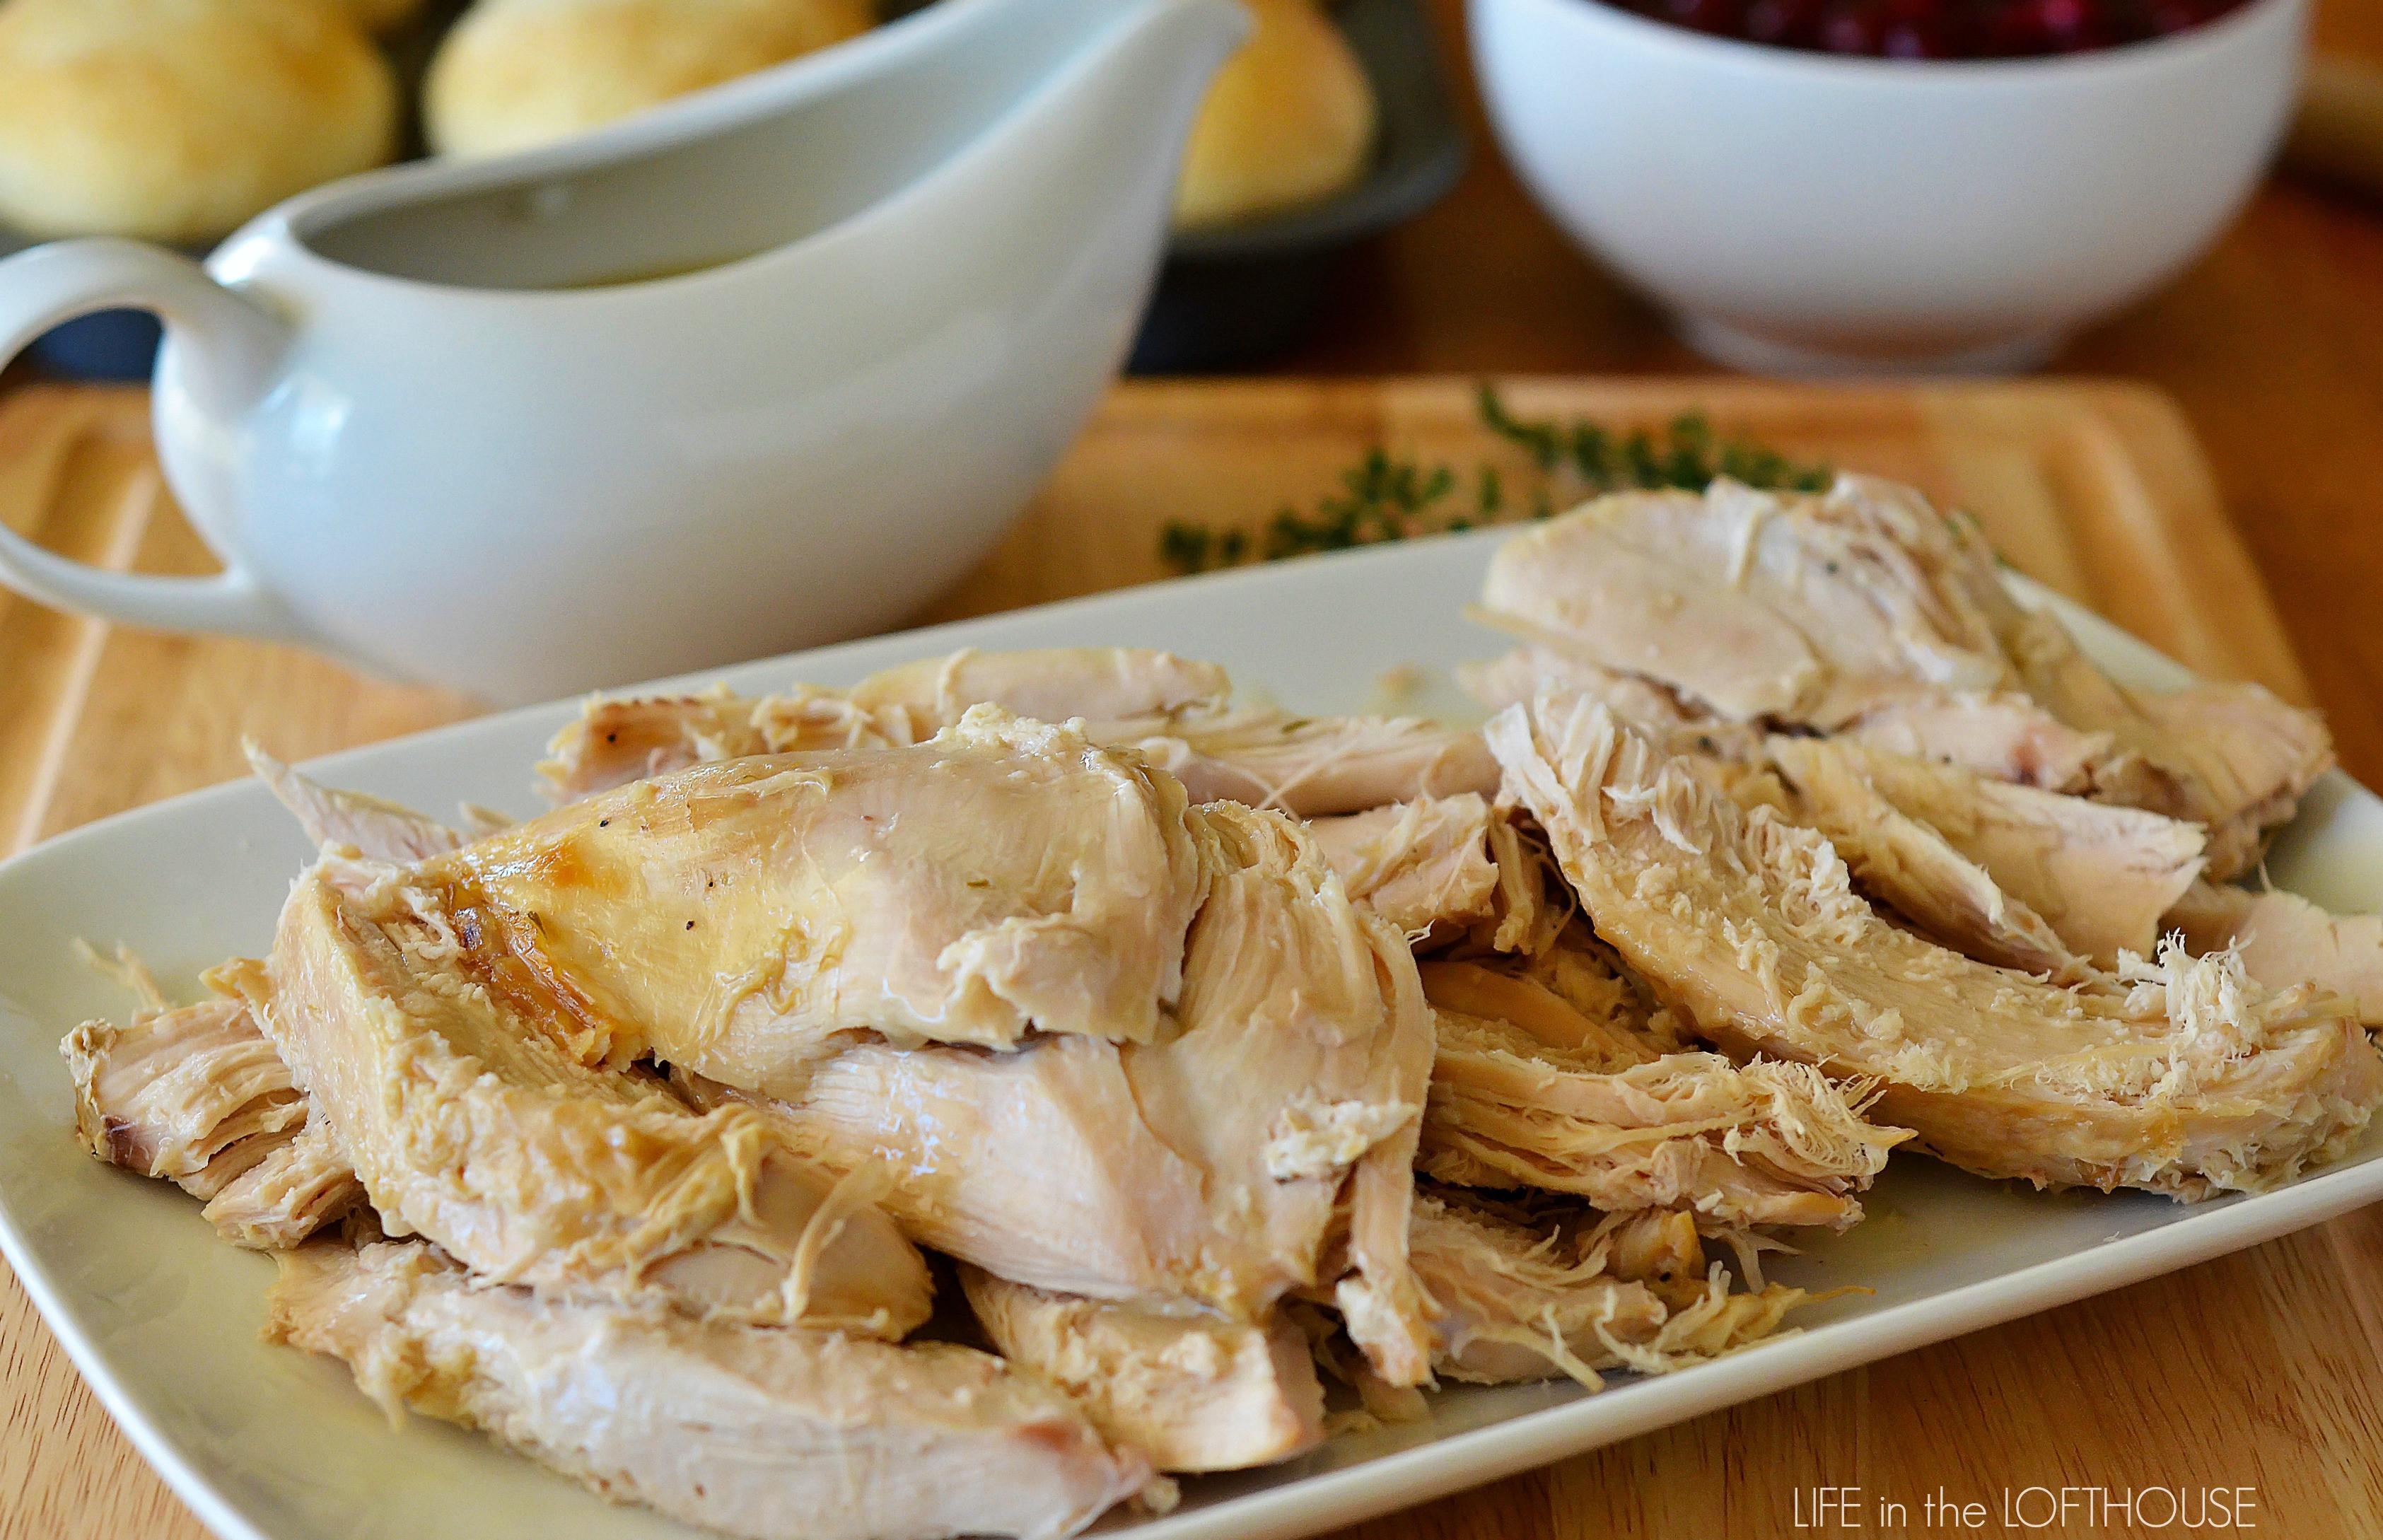 Crock Pot Turkey Recipes For Thanksgiving  Crock Pot Turkey and Gravy Life In The Lofthouse